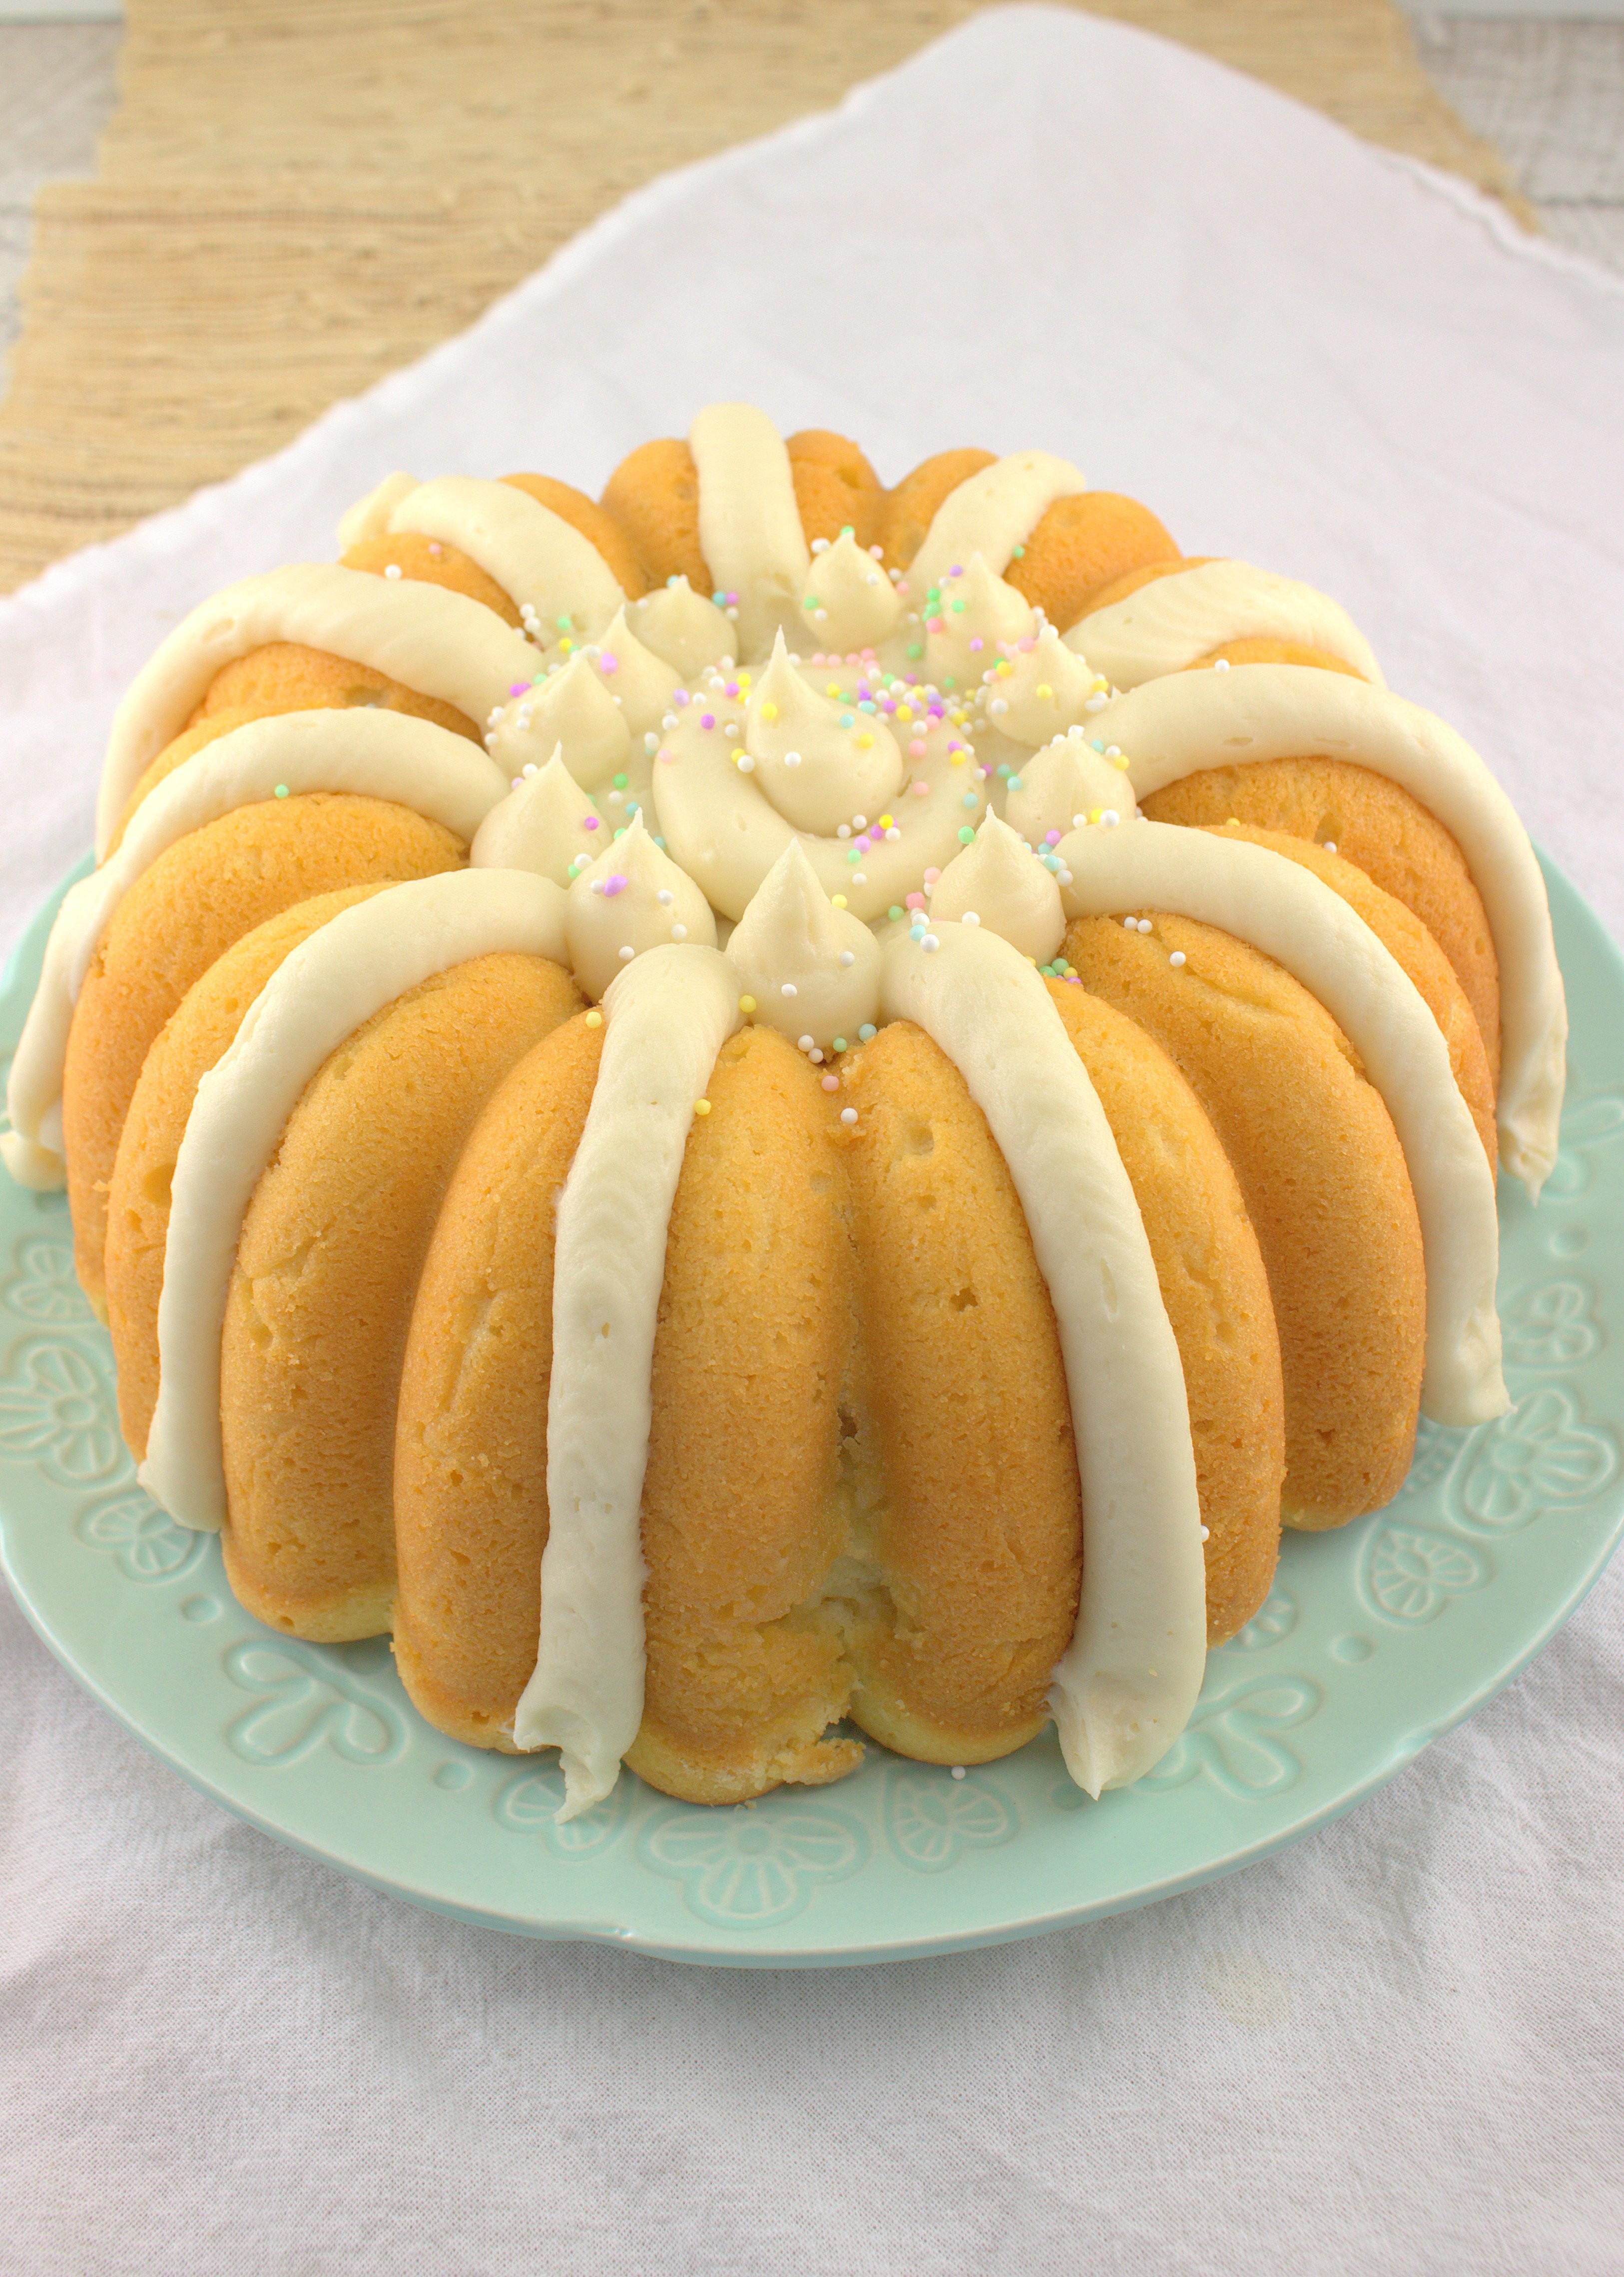 Lemon Bundt Cake  Lemon Bundt Cake with Cream Cheese Frosting BundtBakers